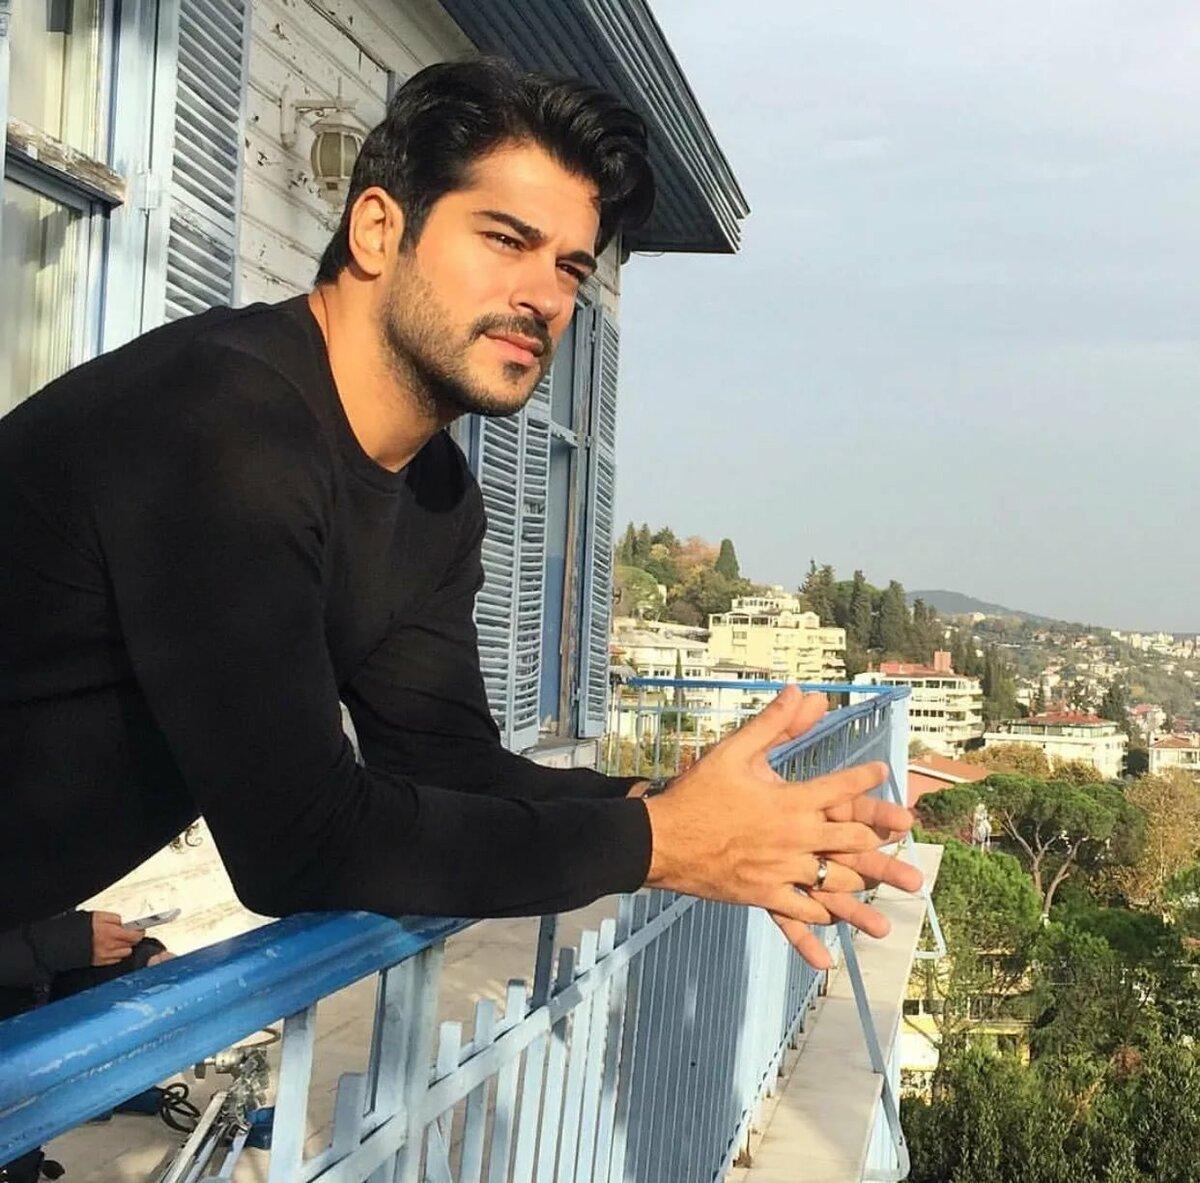 глубина резкости бурак турецкий актер фото в инстаграм предпочитаете